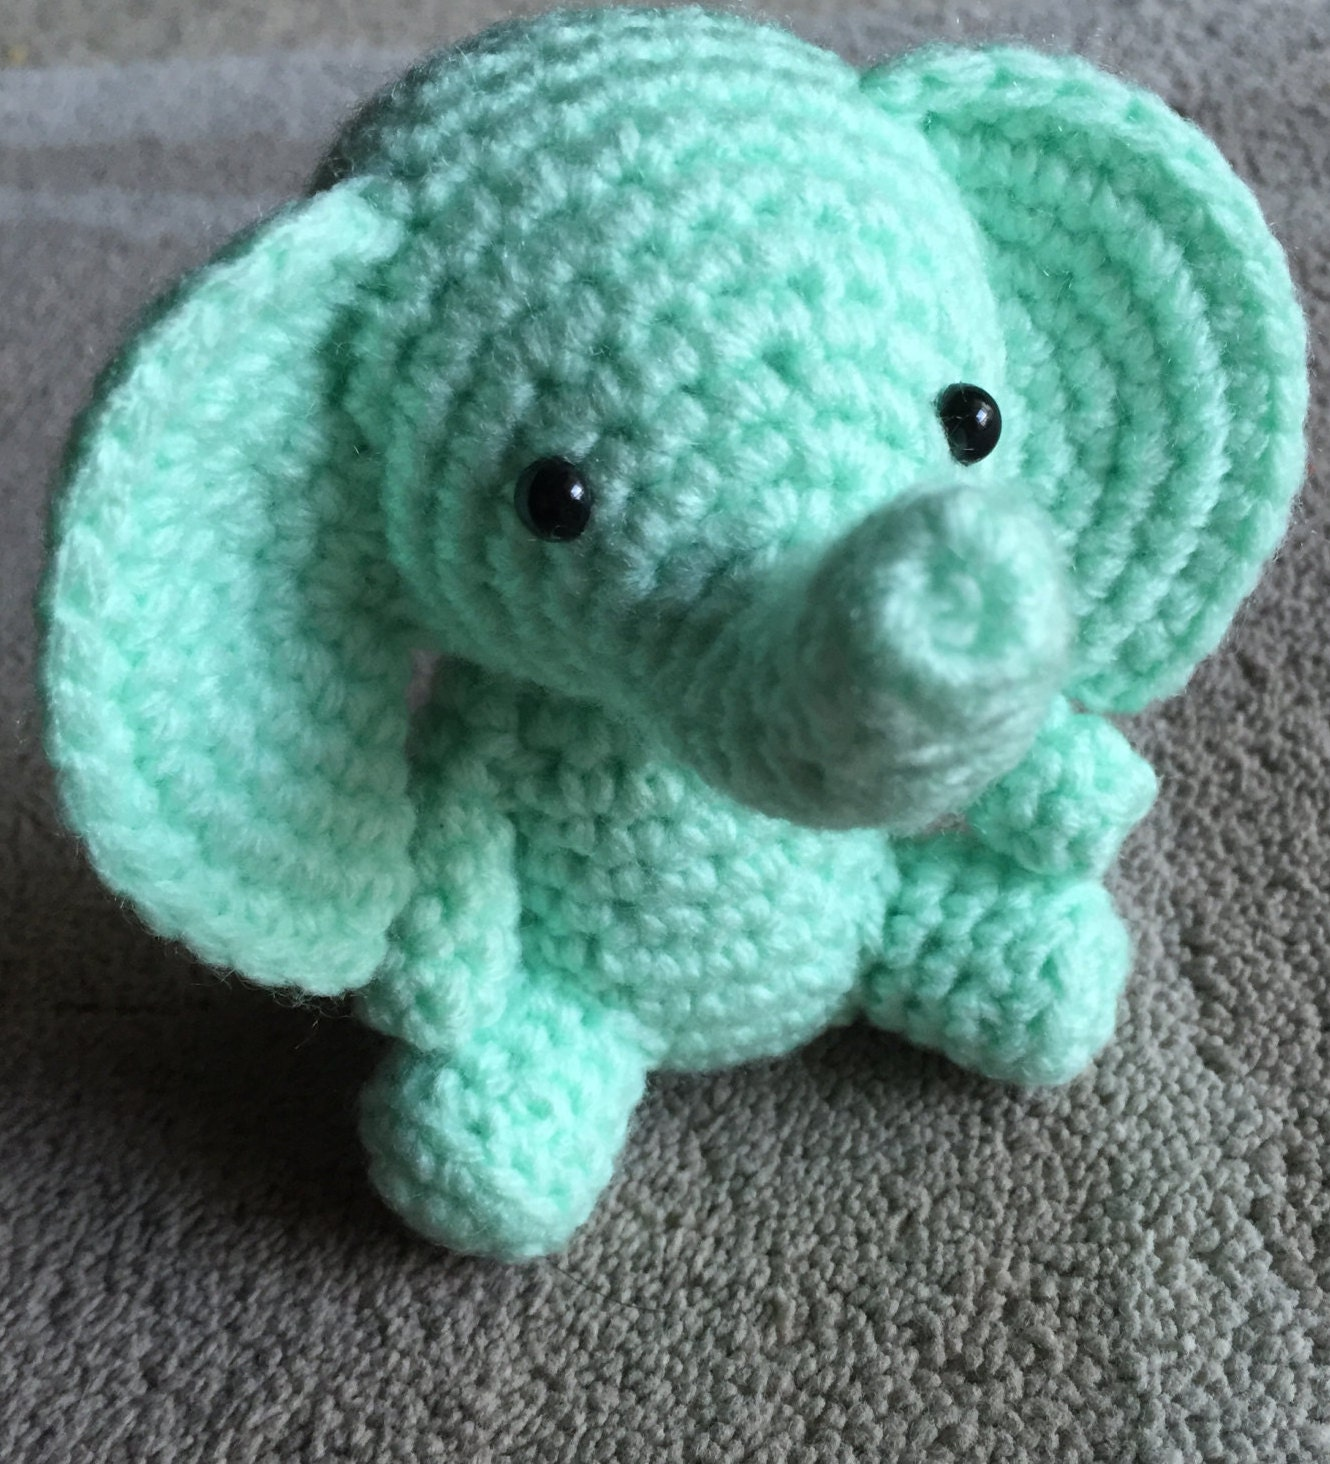 Amigurumi Triangle Ears : Mint Green Elephant Amigurumi Elephant Crochet Elephant